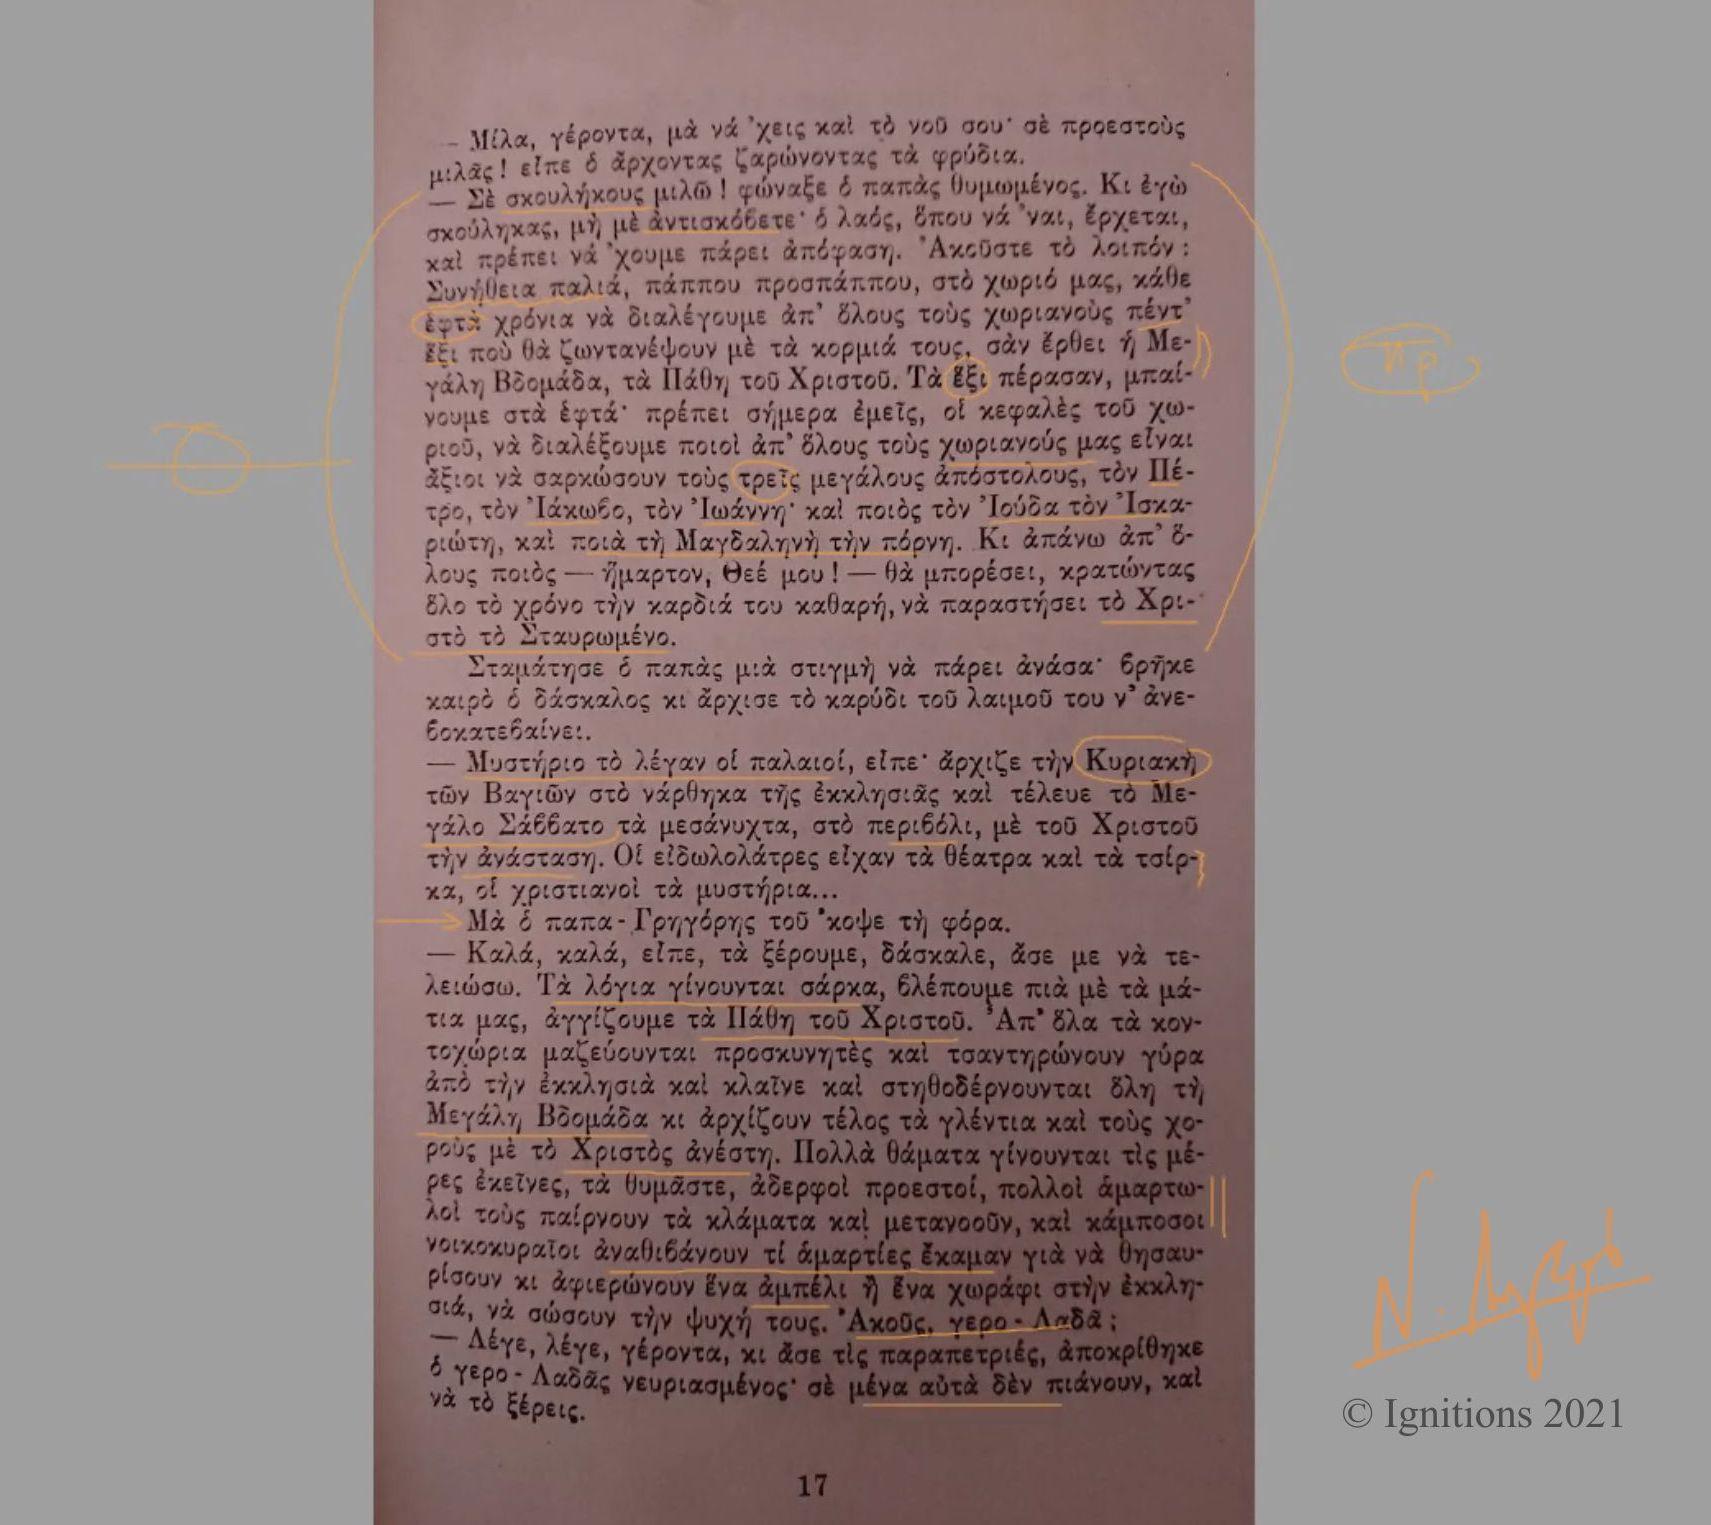 60112 - XII - Η συνέχεια της Σταύρωσης του Χριστού. Συνέχεια IX. (Dessin)